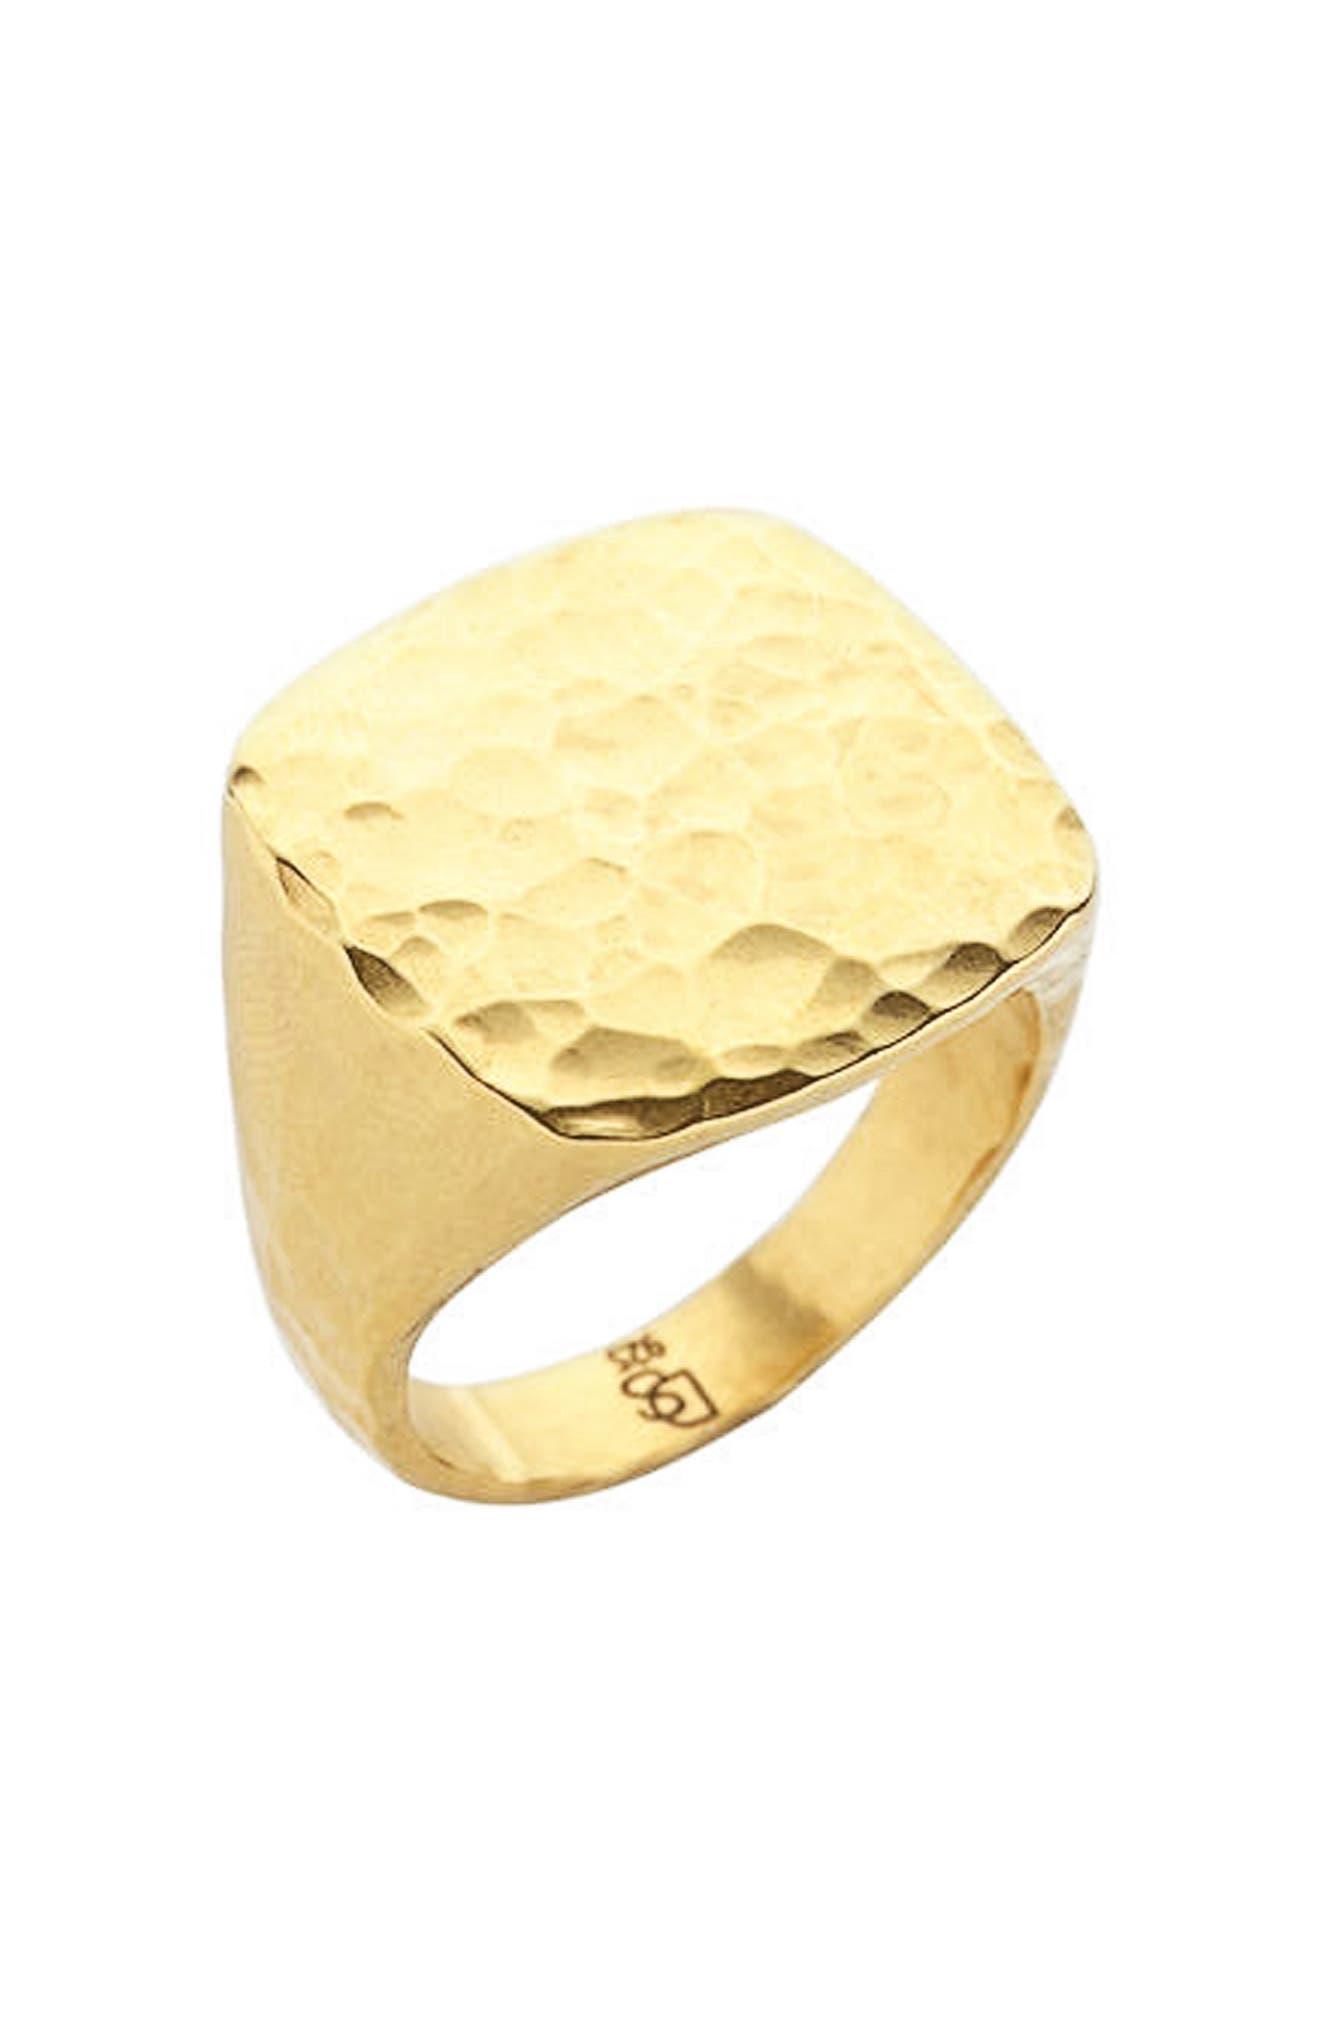 Square Hammered Ring,                             Main thumbnail 1, color,                             GOLD